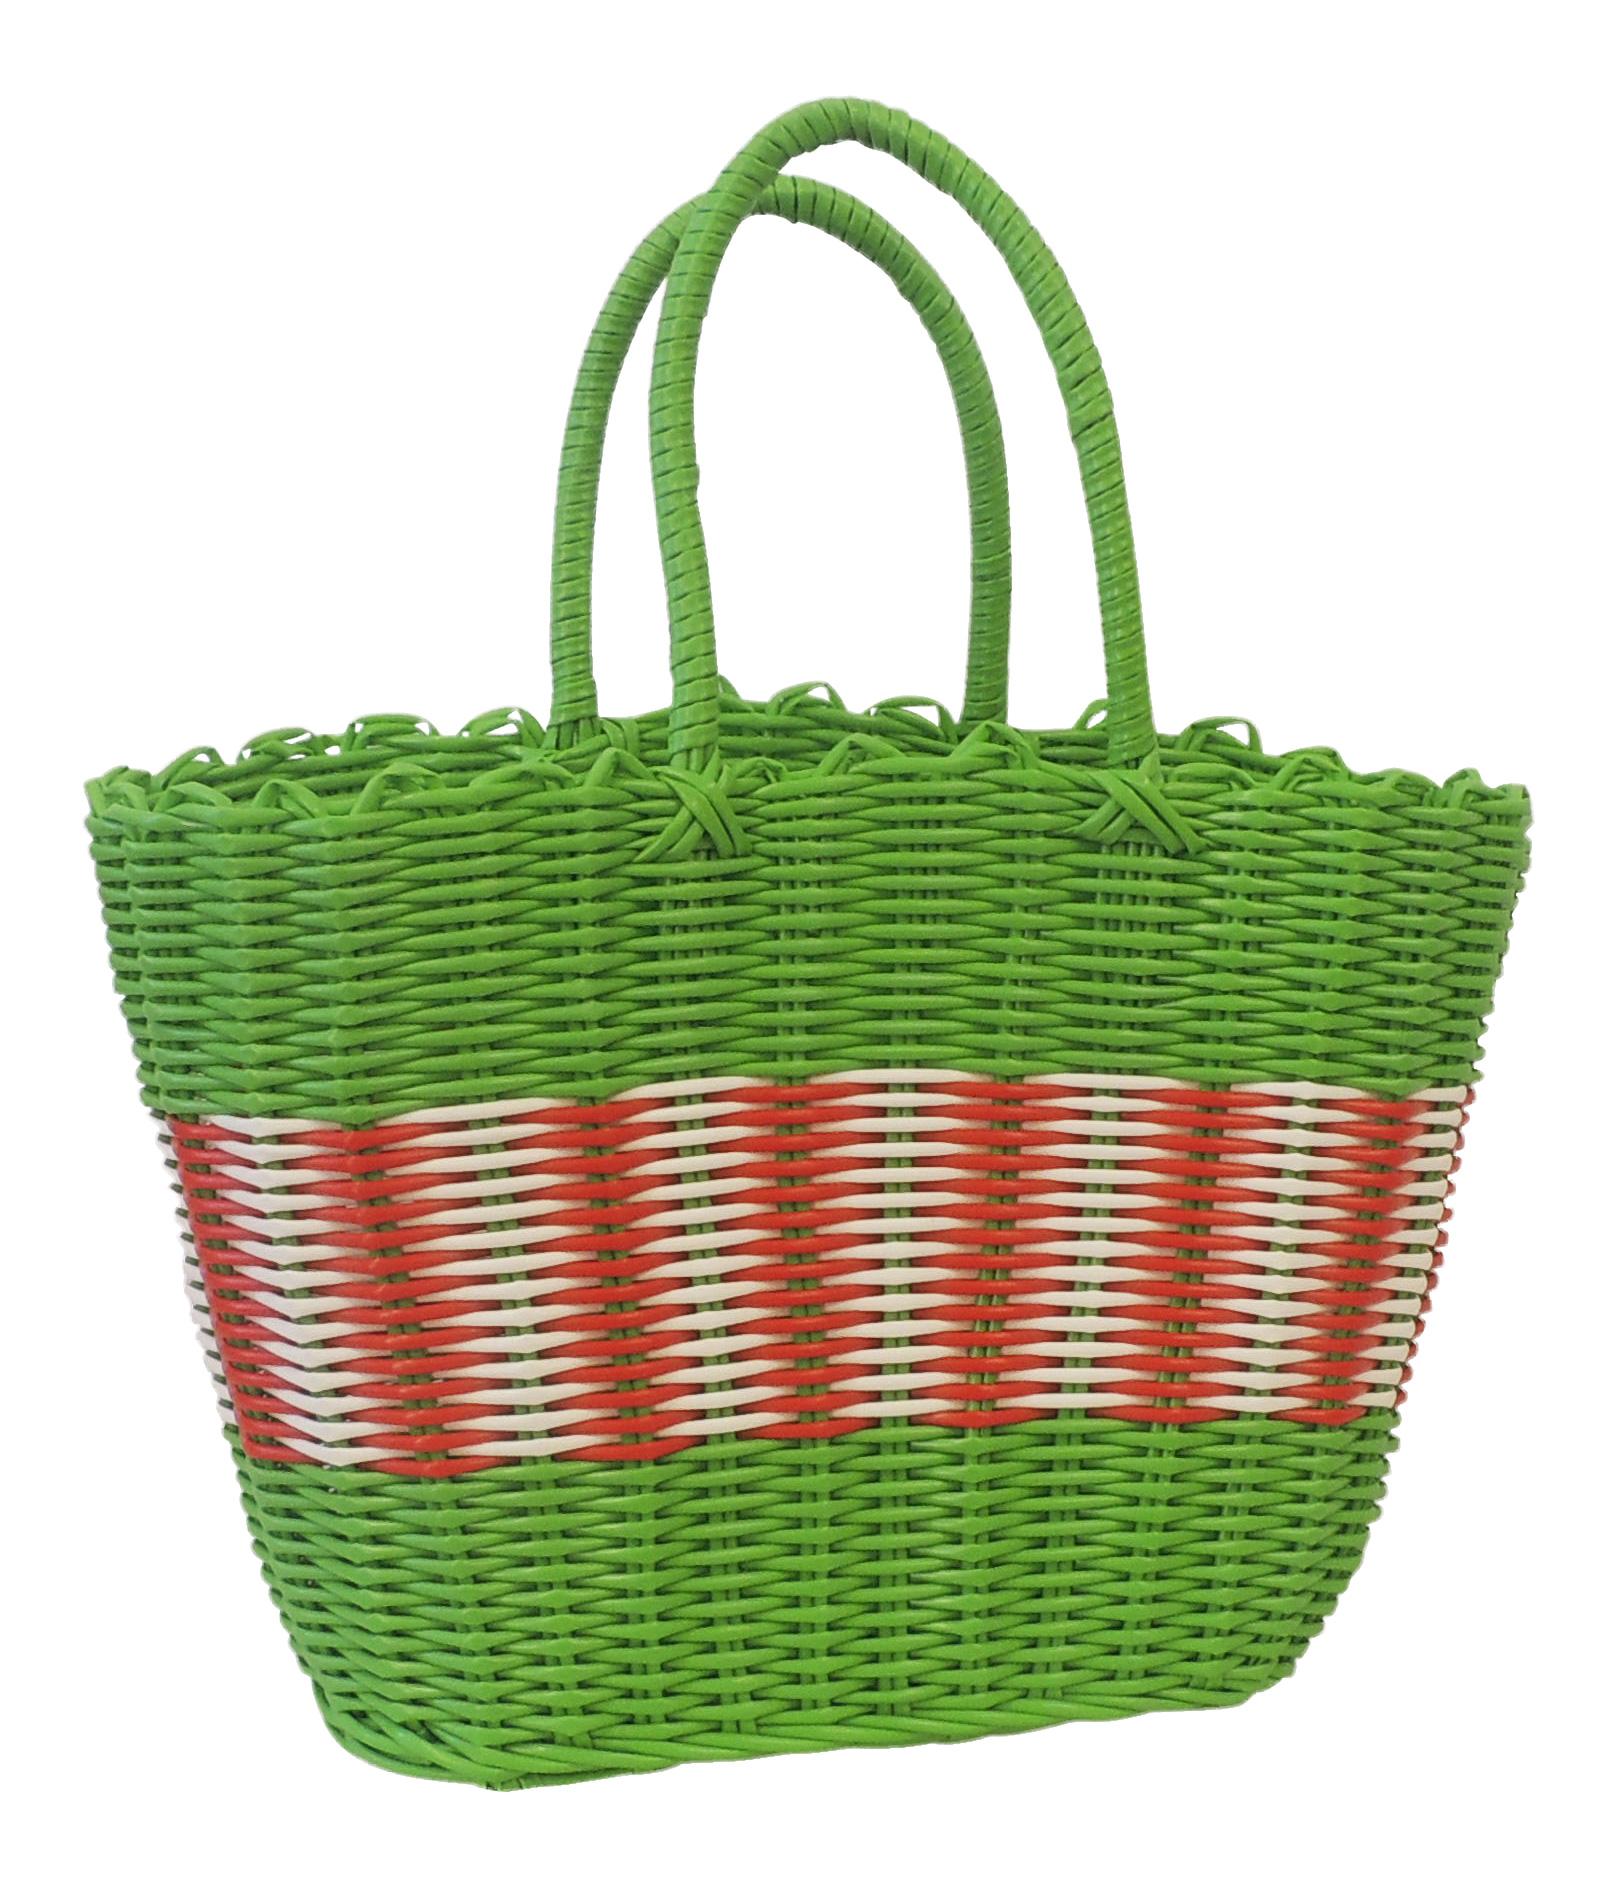 Woven Shopping Basket Uk : New retro s style green plastic woven beach